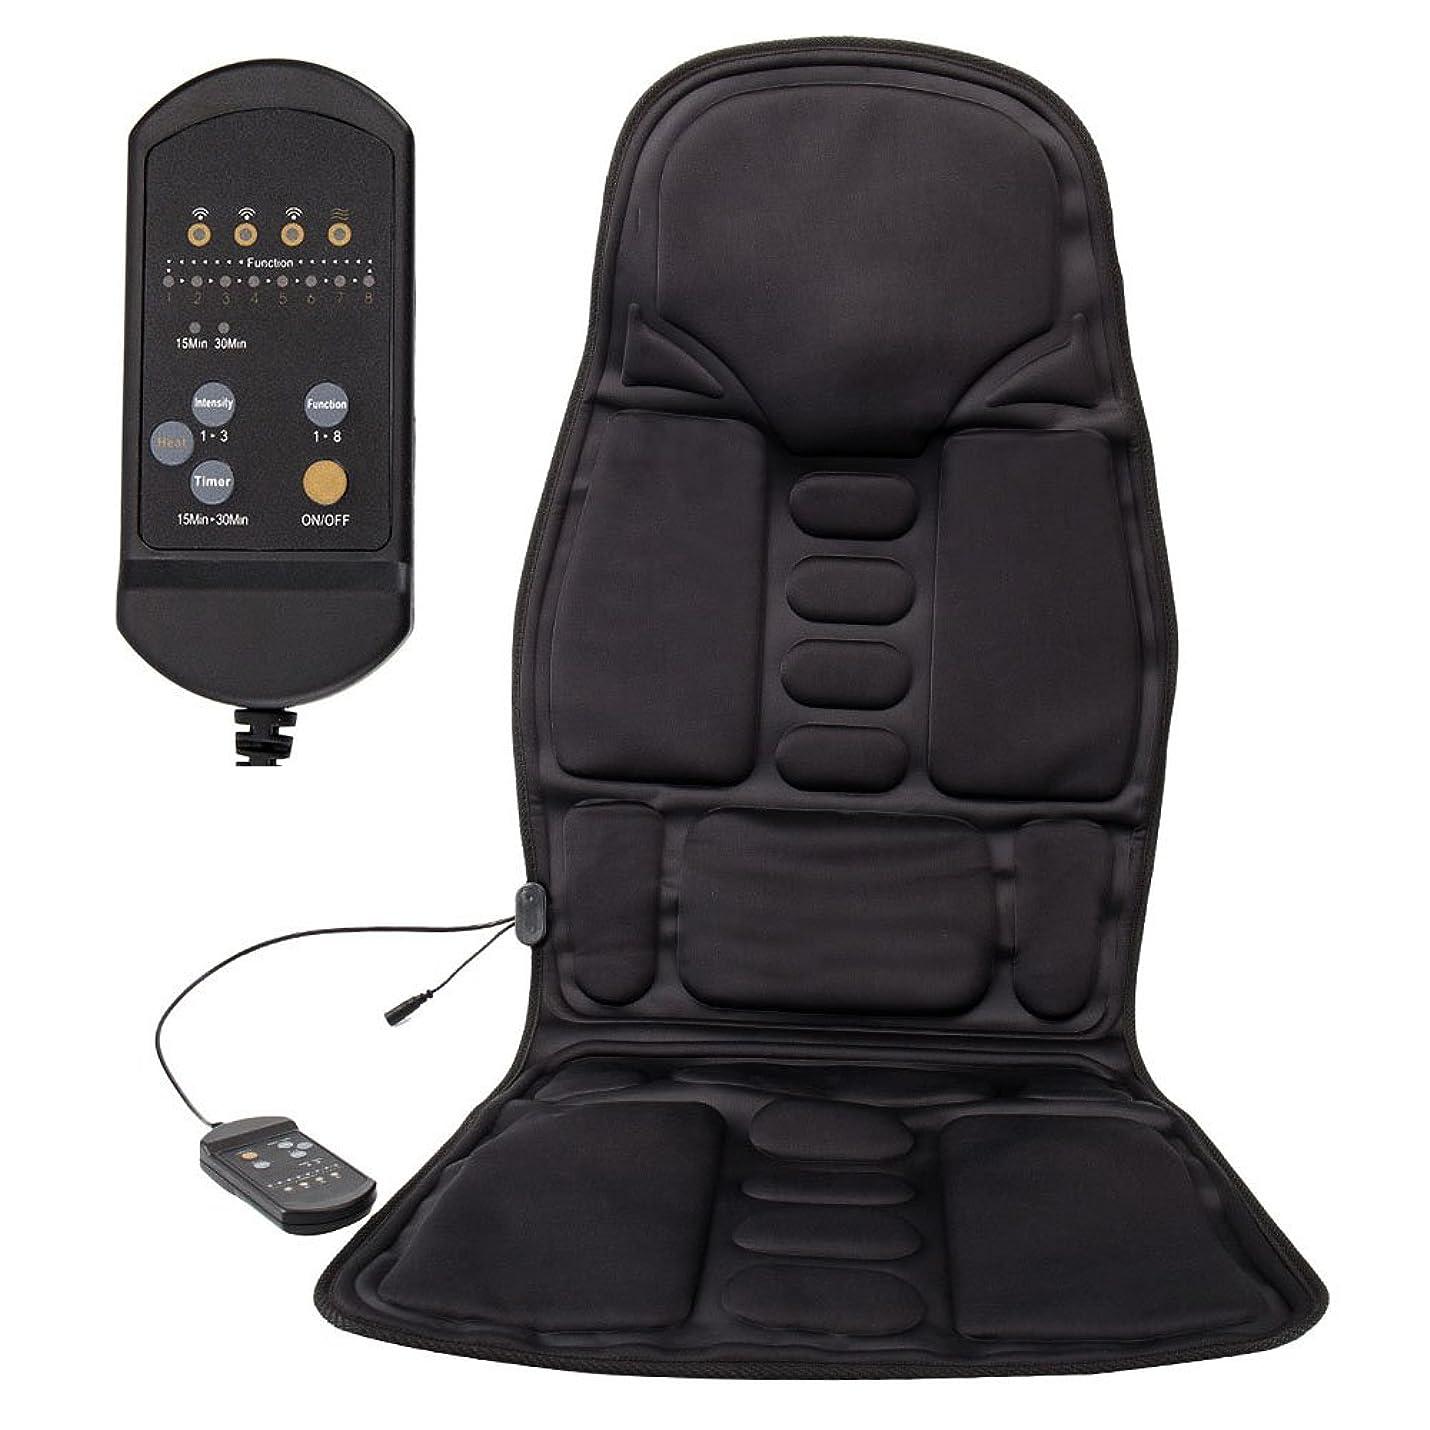 LoveStory マッサージシート シートマッサージャー カーシートカバー マッサージ器 座椅子用 高品質PUレザー製車載用ツインバードマッサージシート ヒーターマッサージ 5機能5もみ玉付き 汎用 椅子や座椅子用 持ち運び便利 取り付け簡単 敬老の日 プレゼント